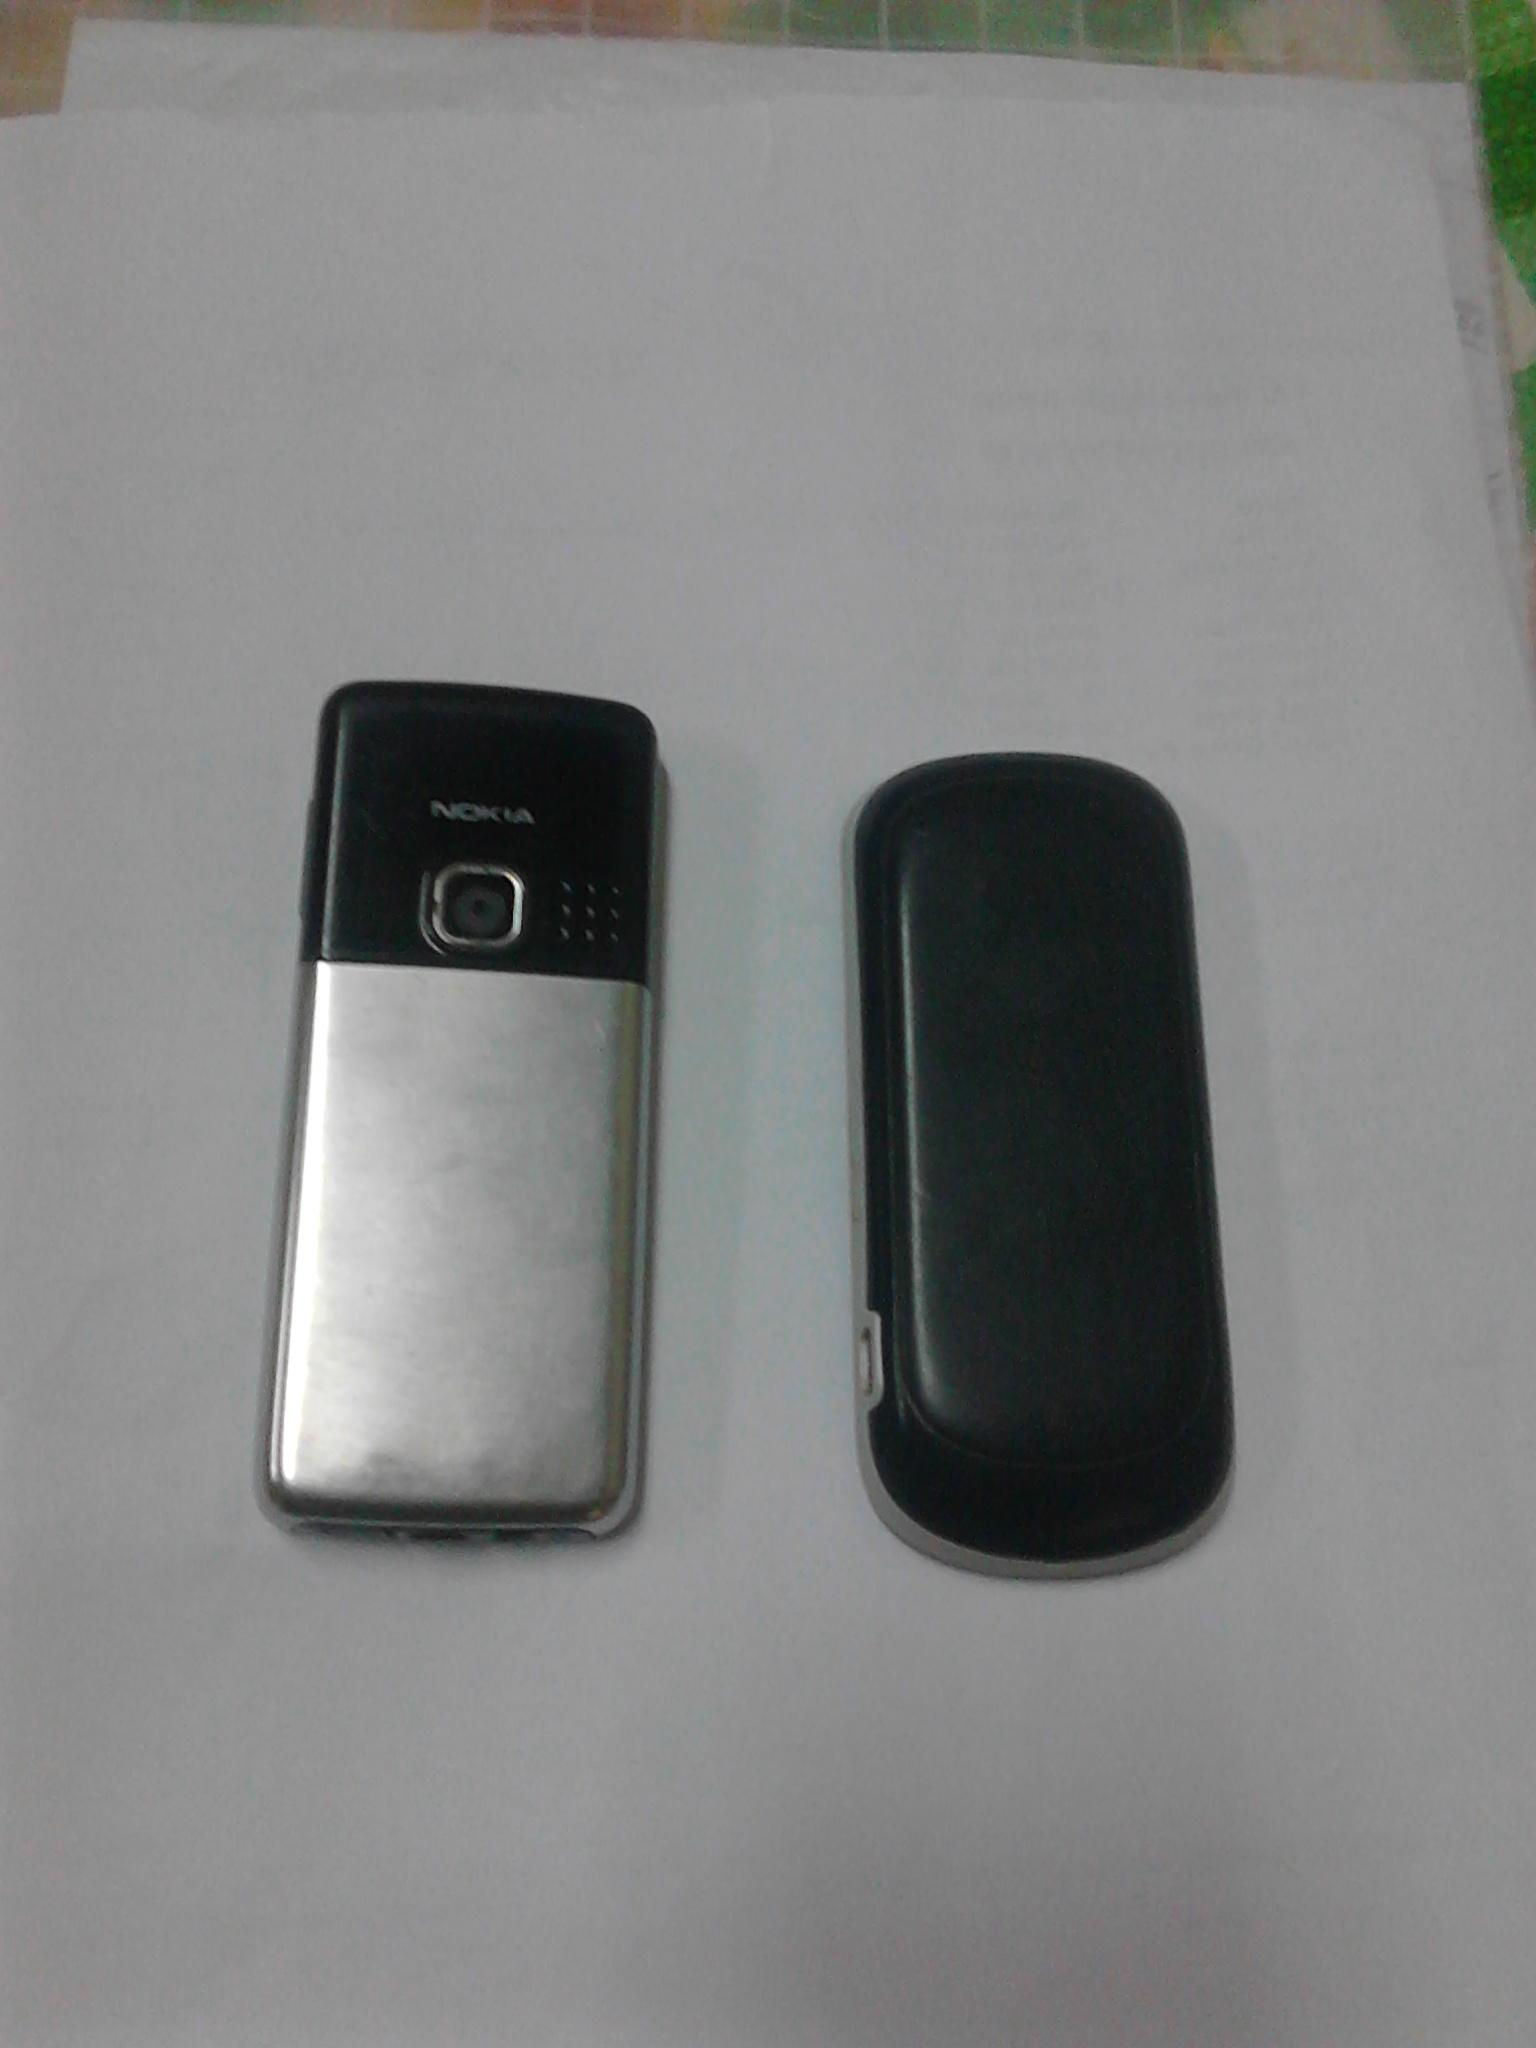 athan mobile nokia 6300